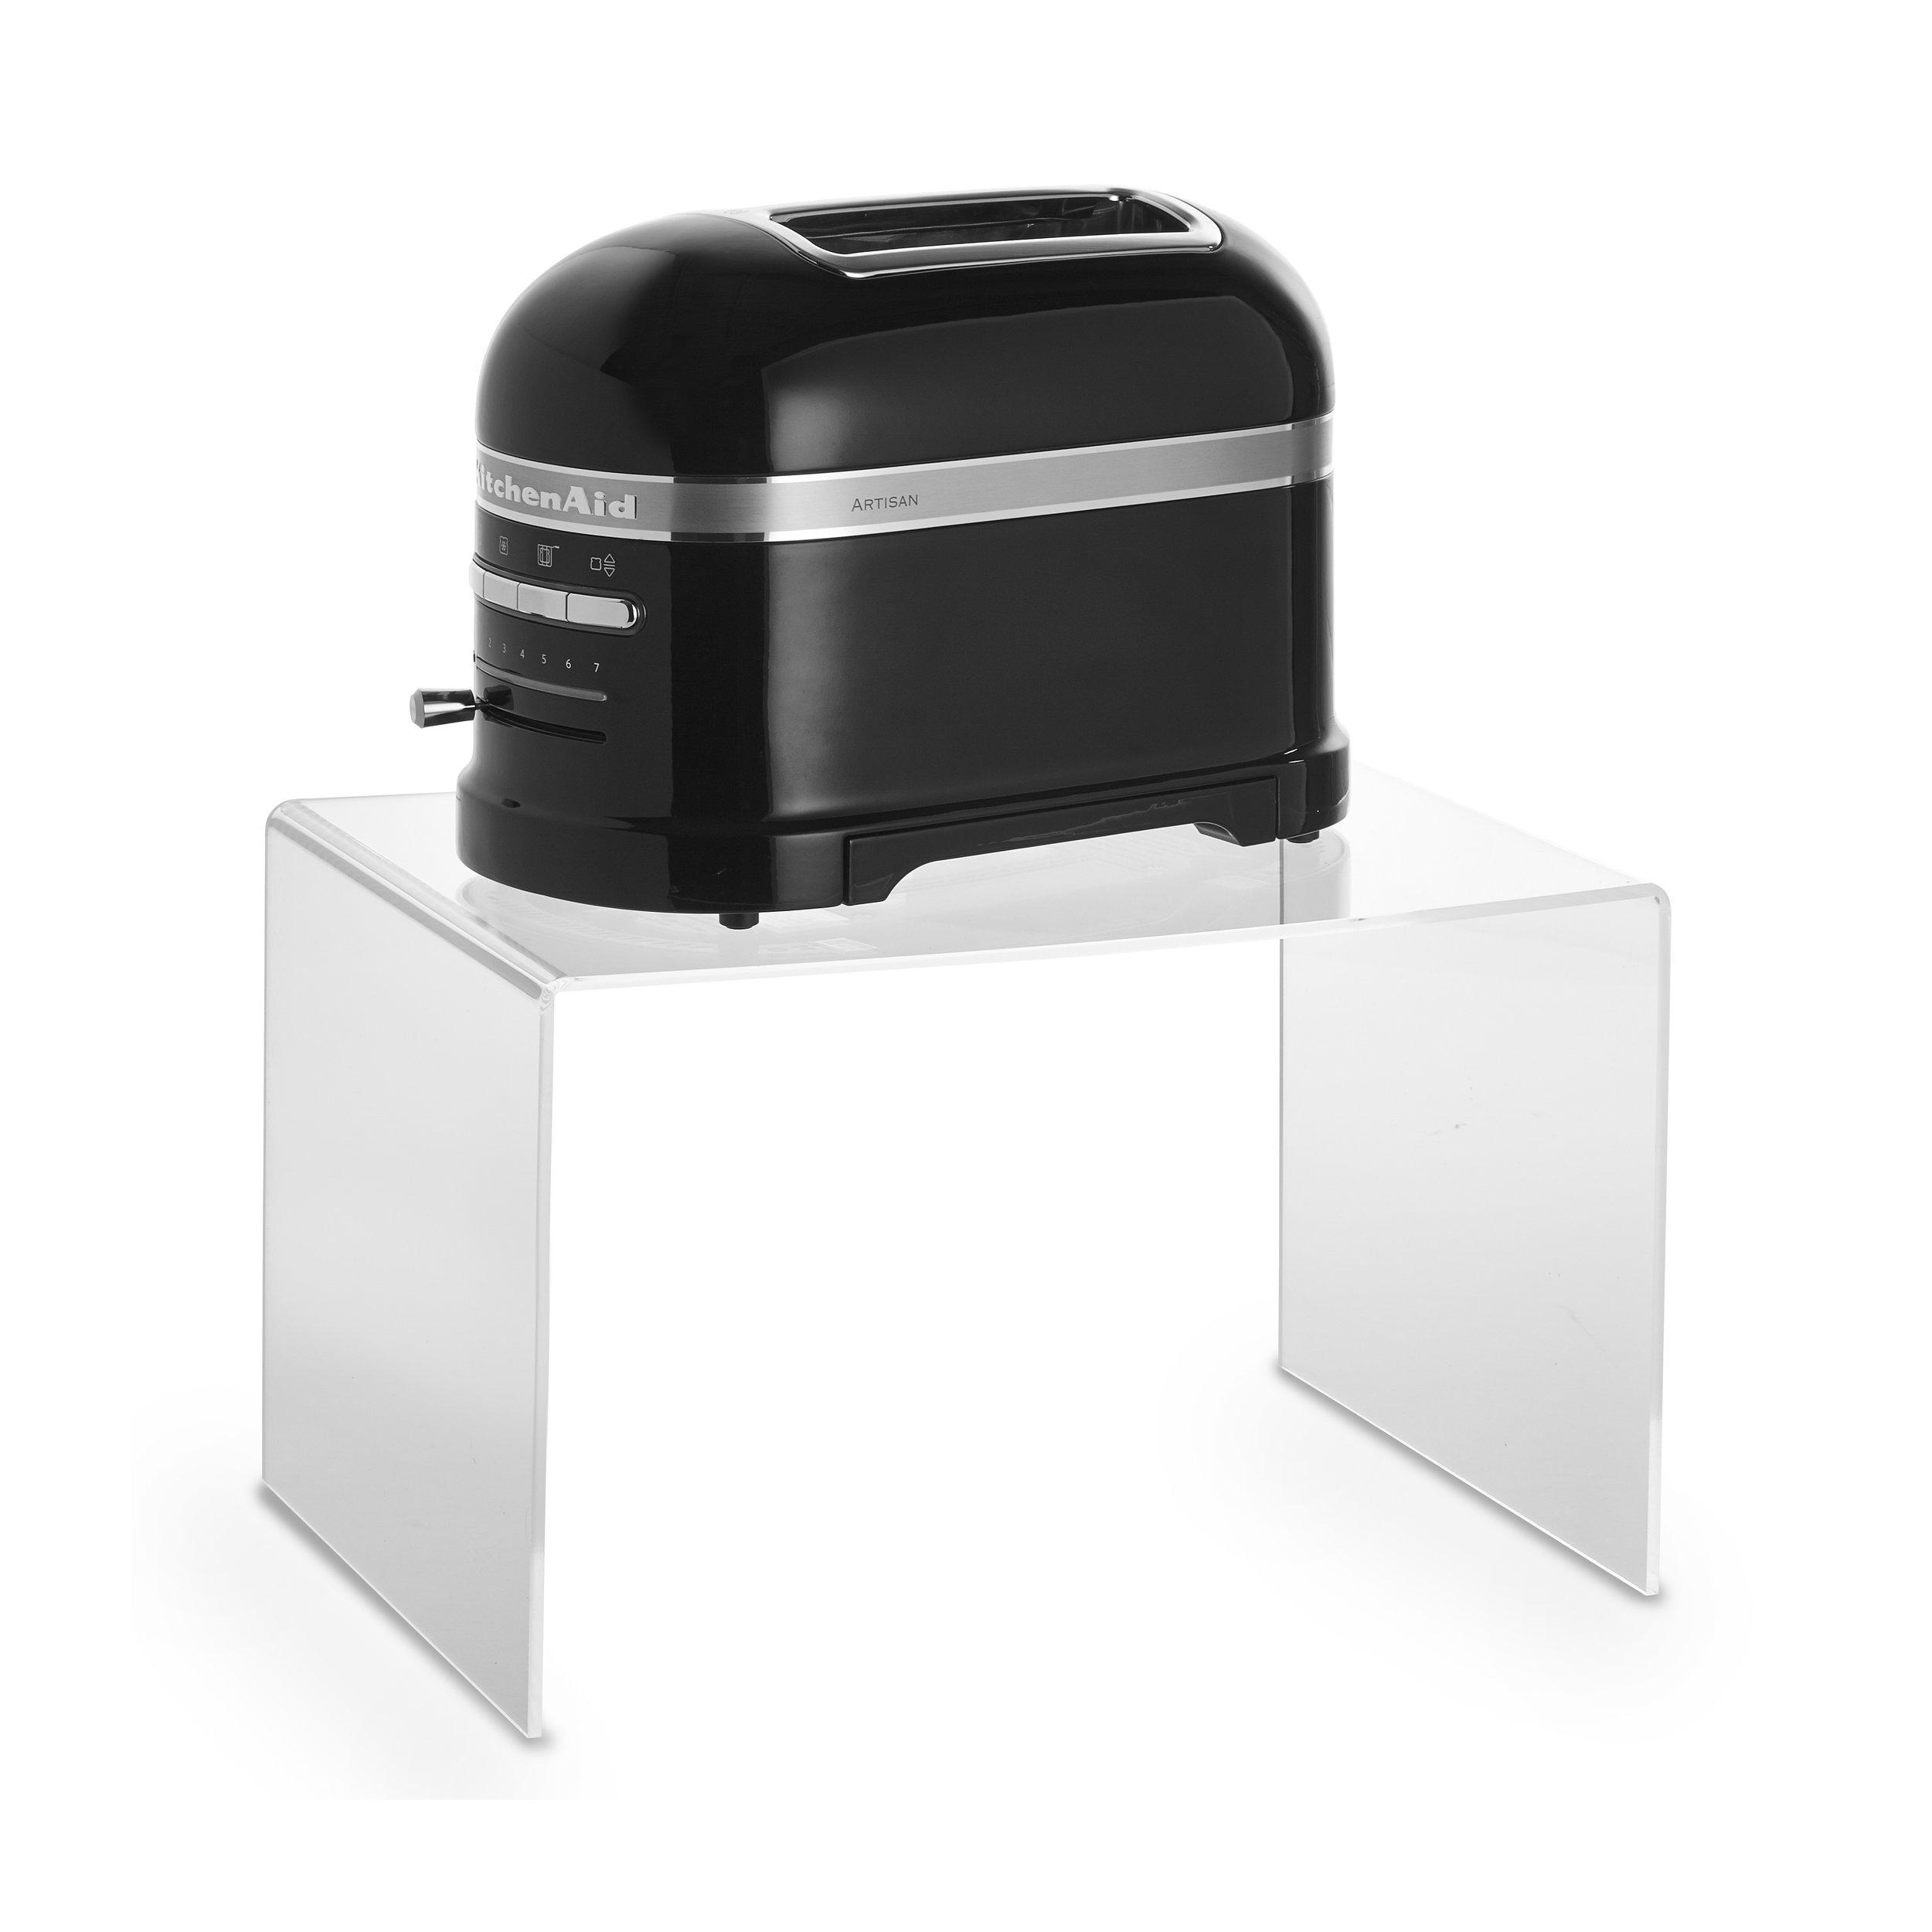 shopfitting warehouse product photography packshot white background bridge black kettle appliance.jpg